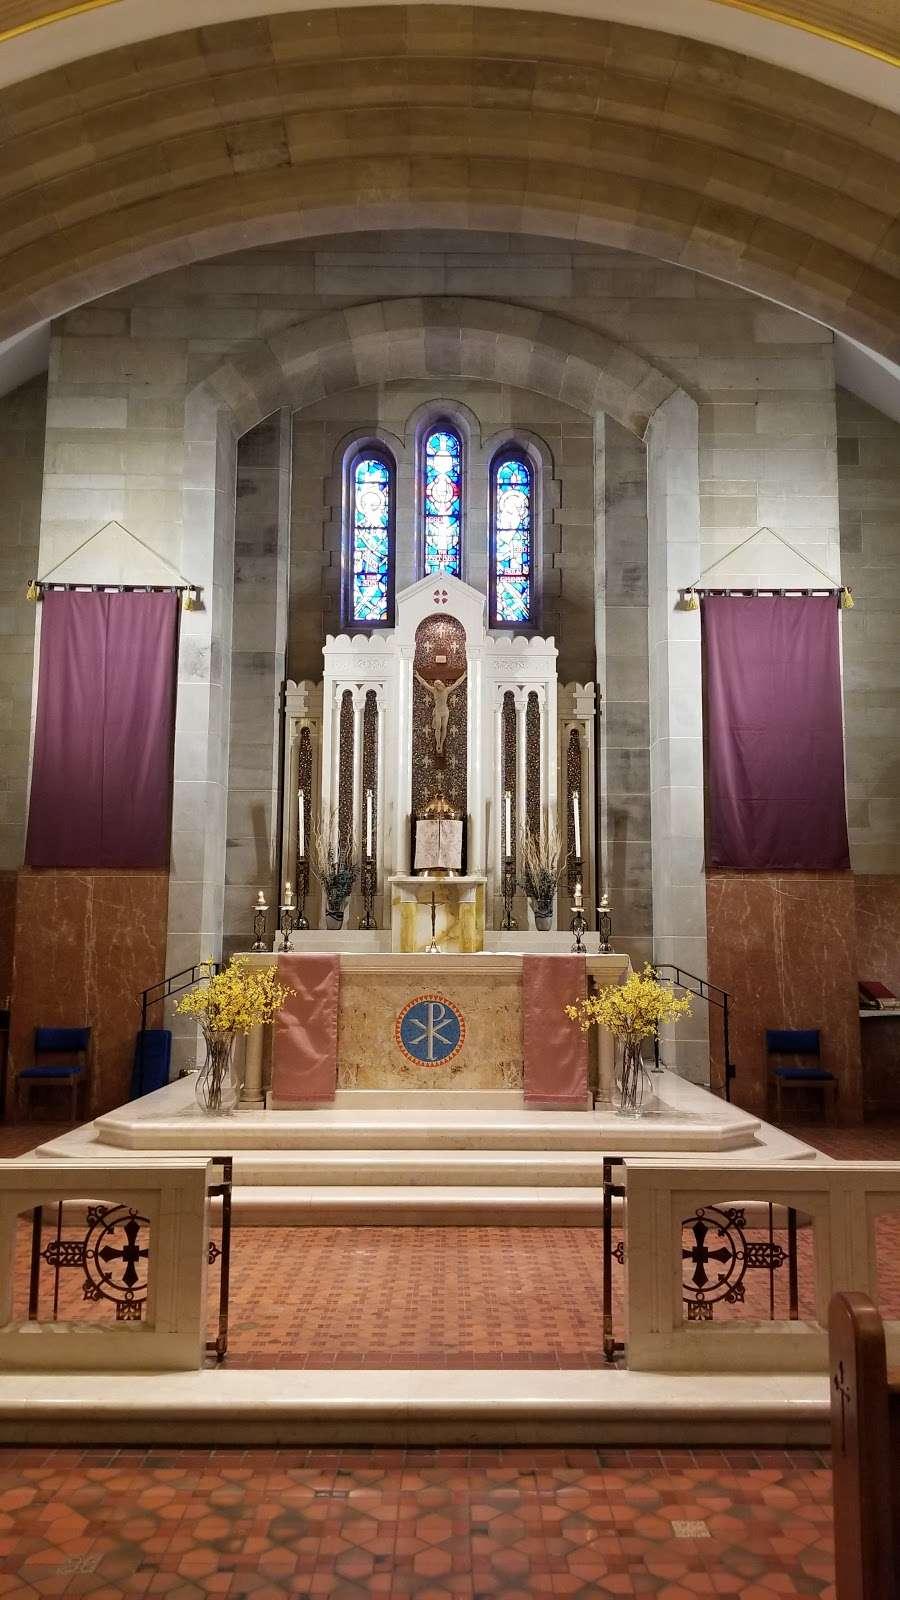 St Josephs Church - church    Photo 2 of 10   Address: 500 Woodlawn Ave, Collingdale, PA 19023, USA   Phone: (610) 583-4530